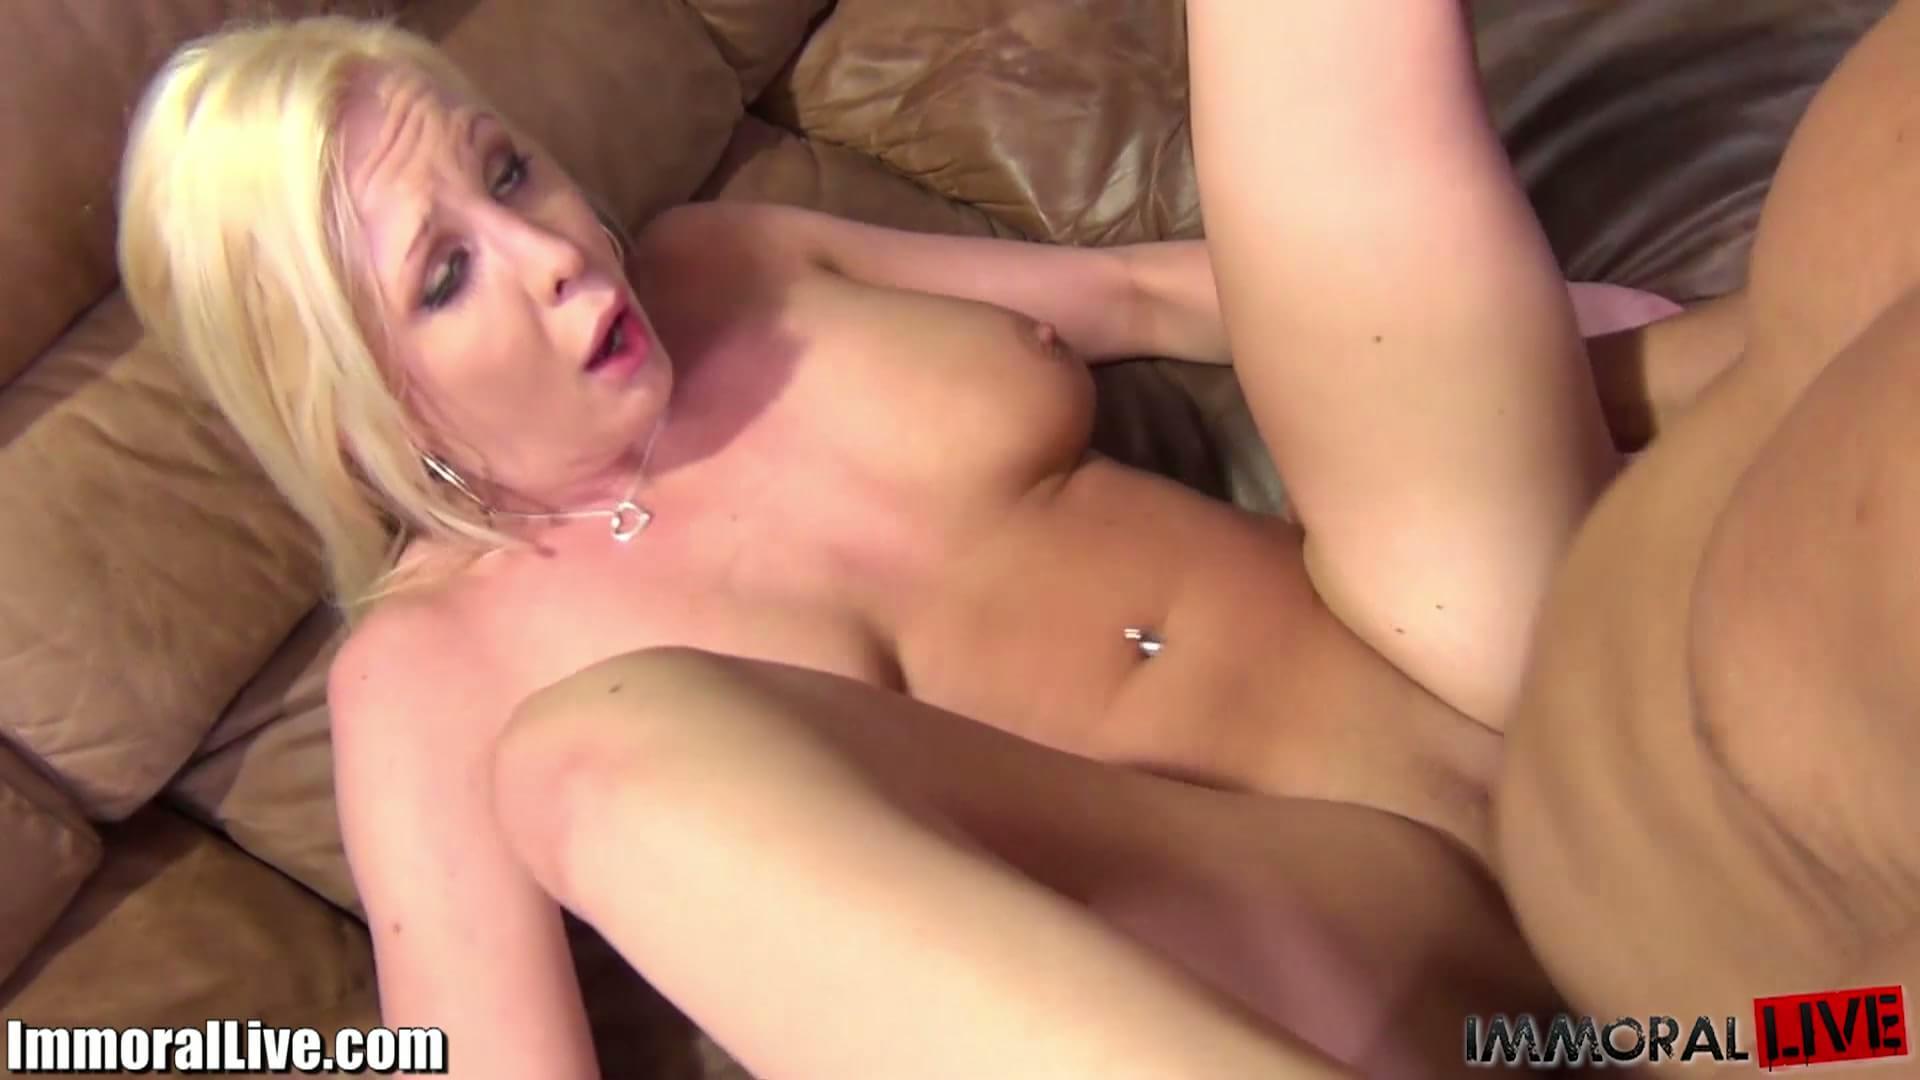 Black sex in pobucli